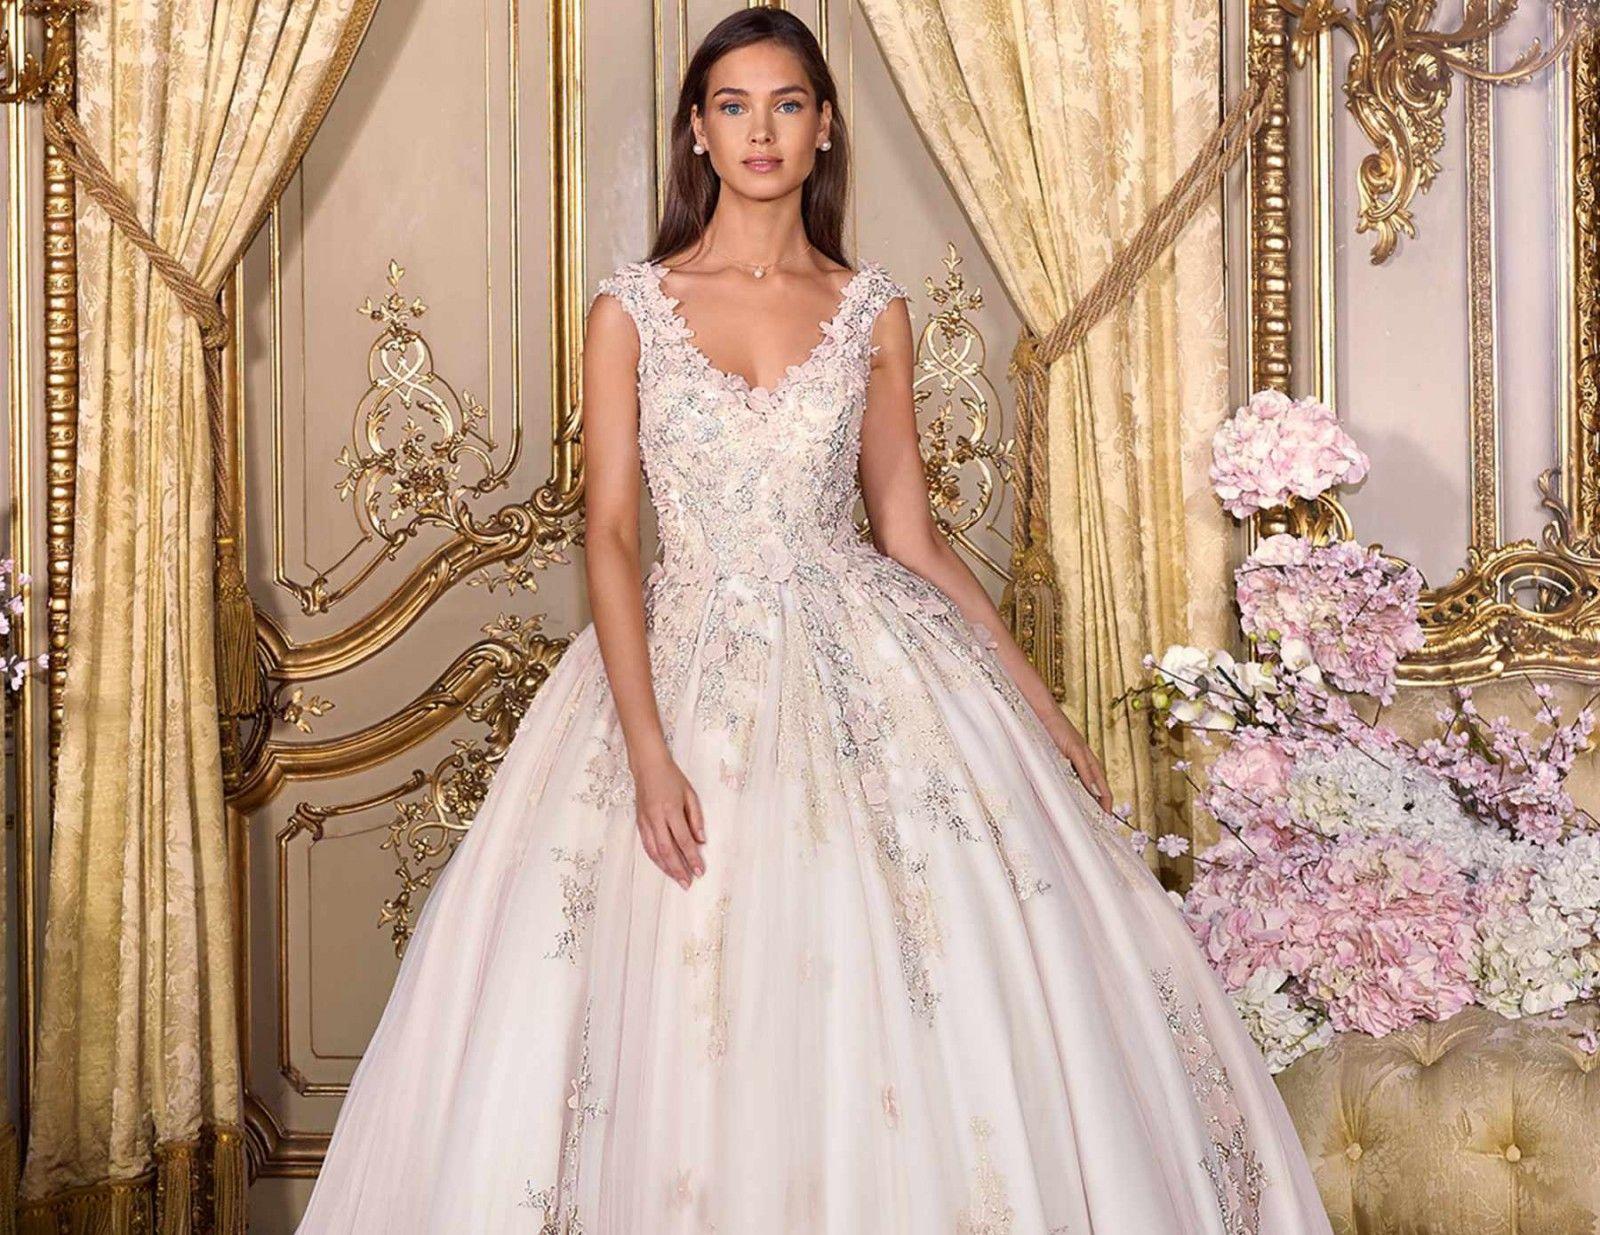 Demetrios ananstasia dp wedding dress in wedding dresses